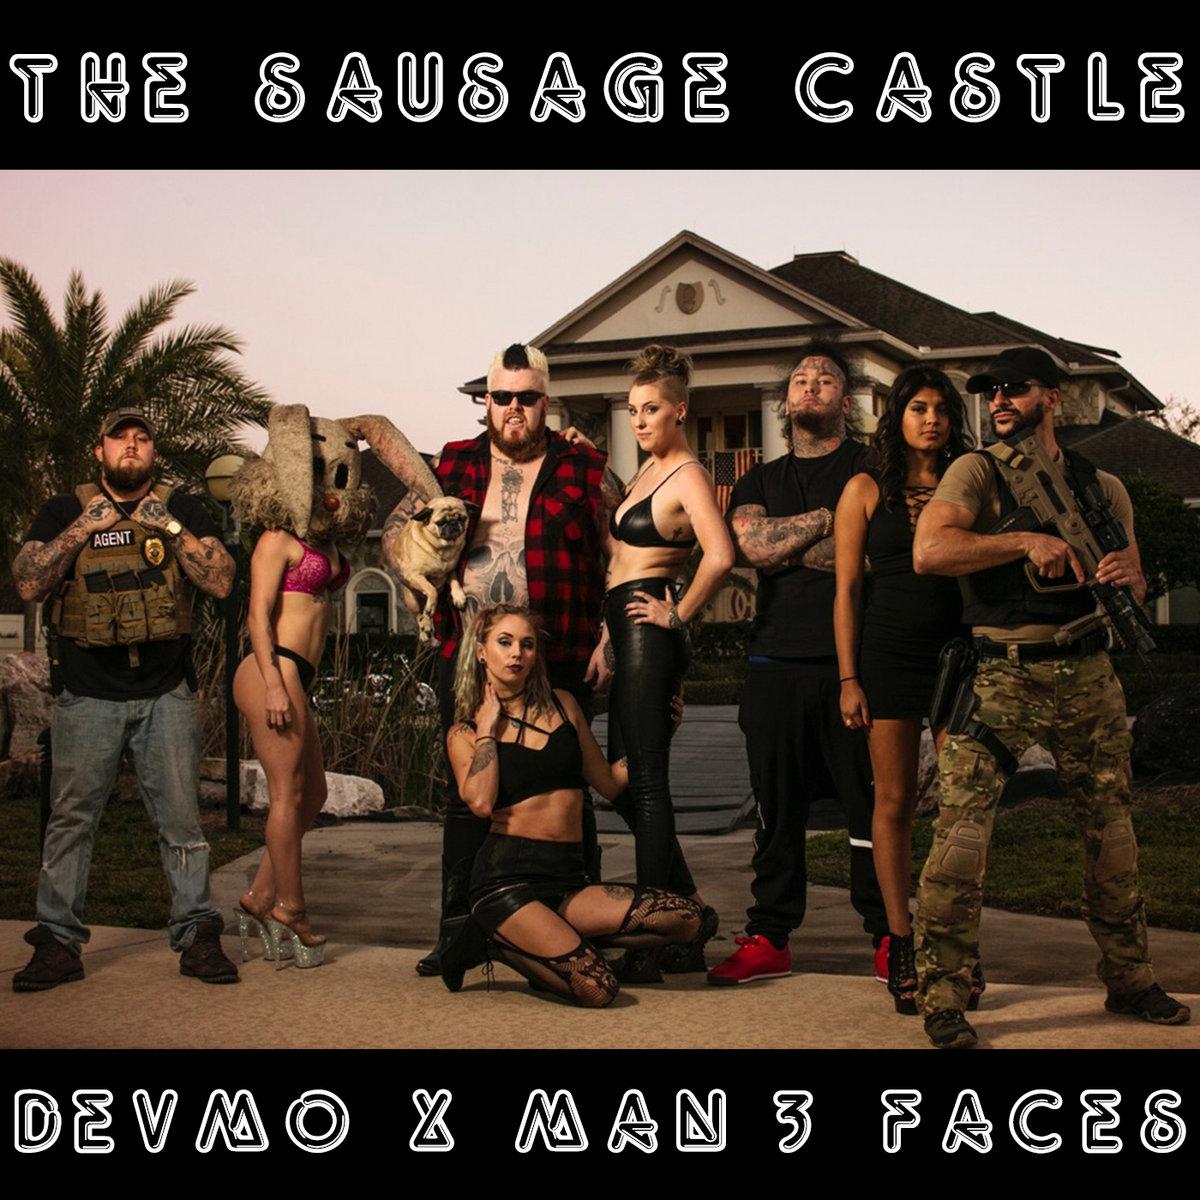 Sausage castle snapchat